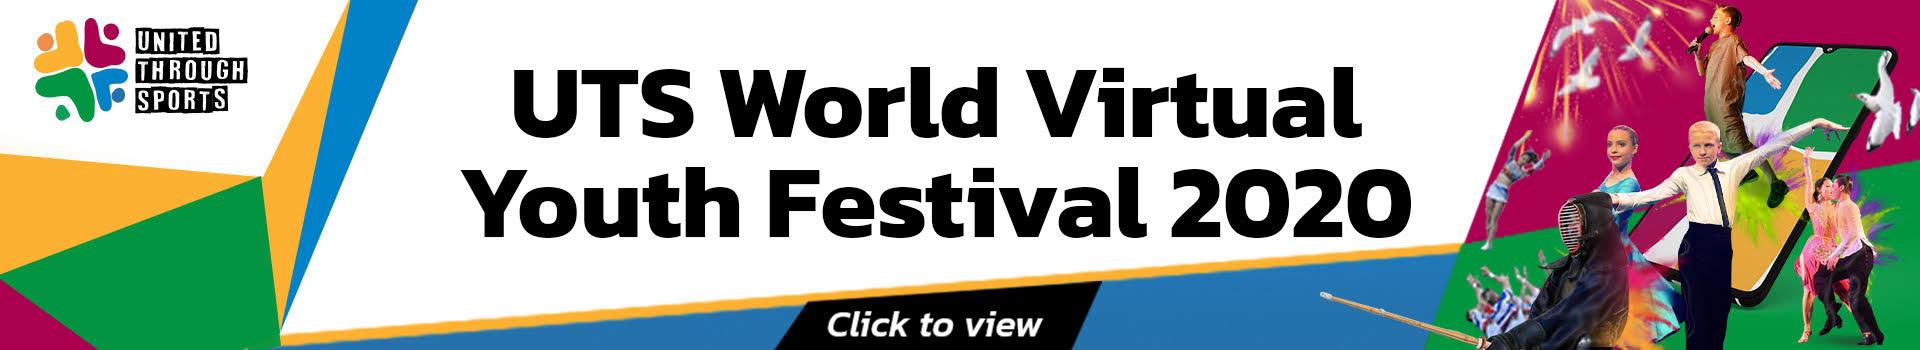 UTS World Virtual Youth Festival 2020 PC